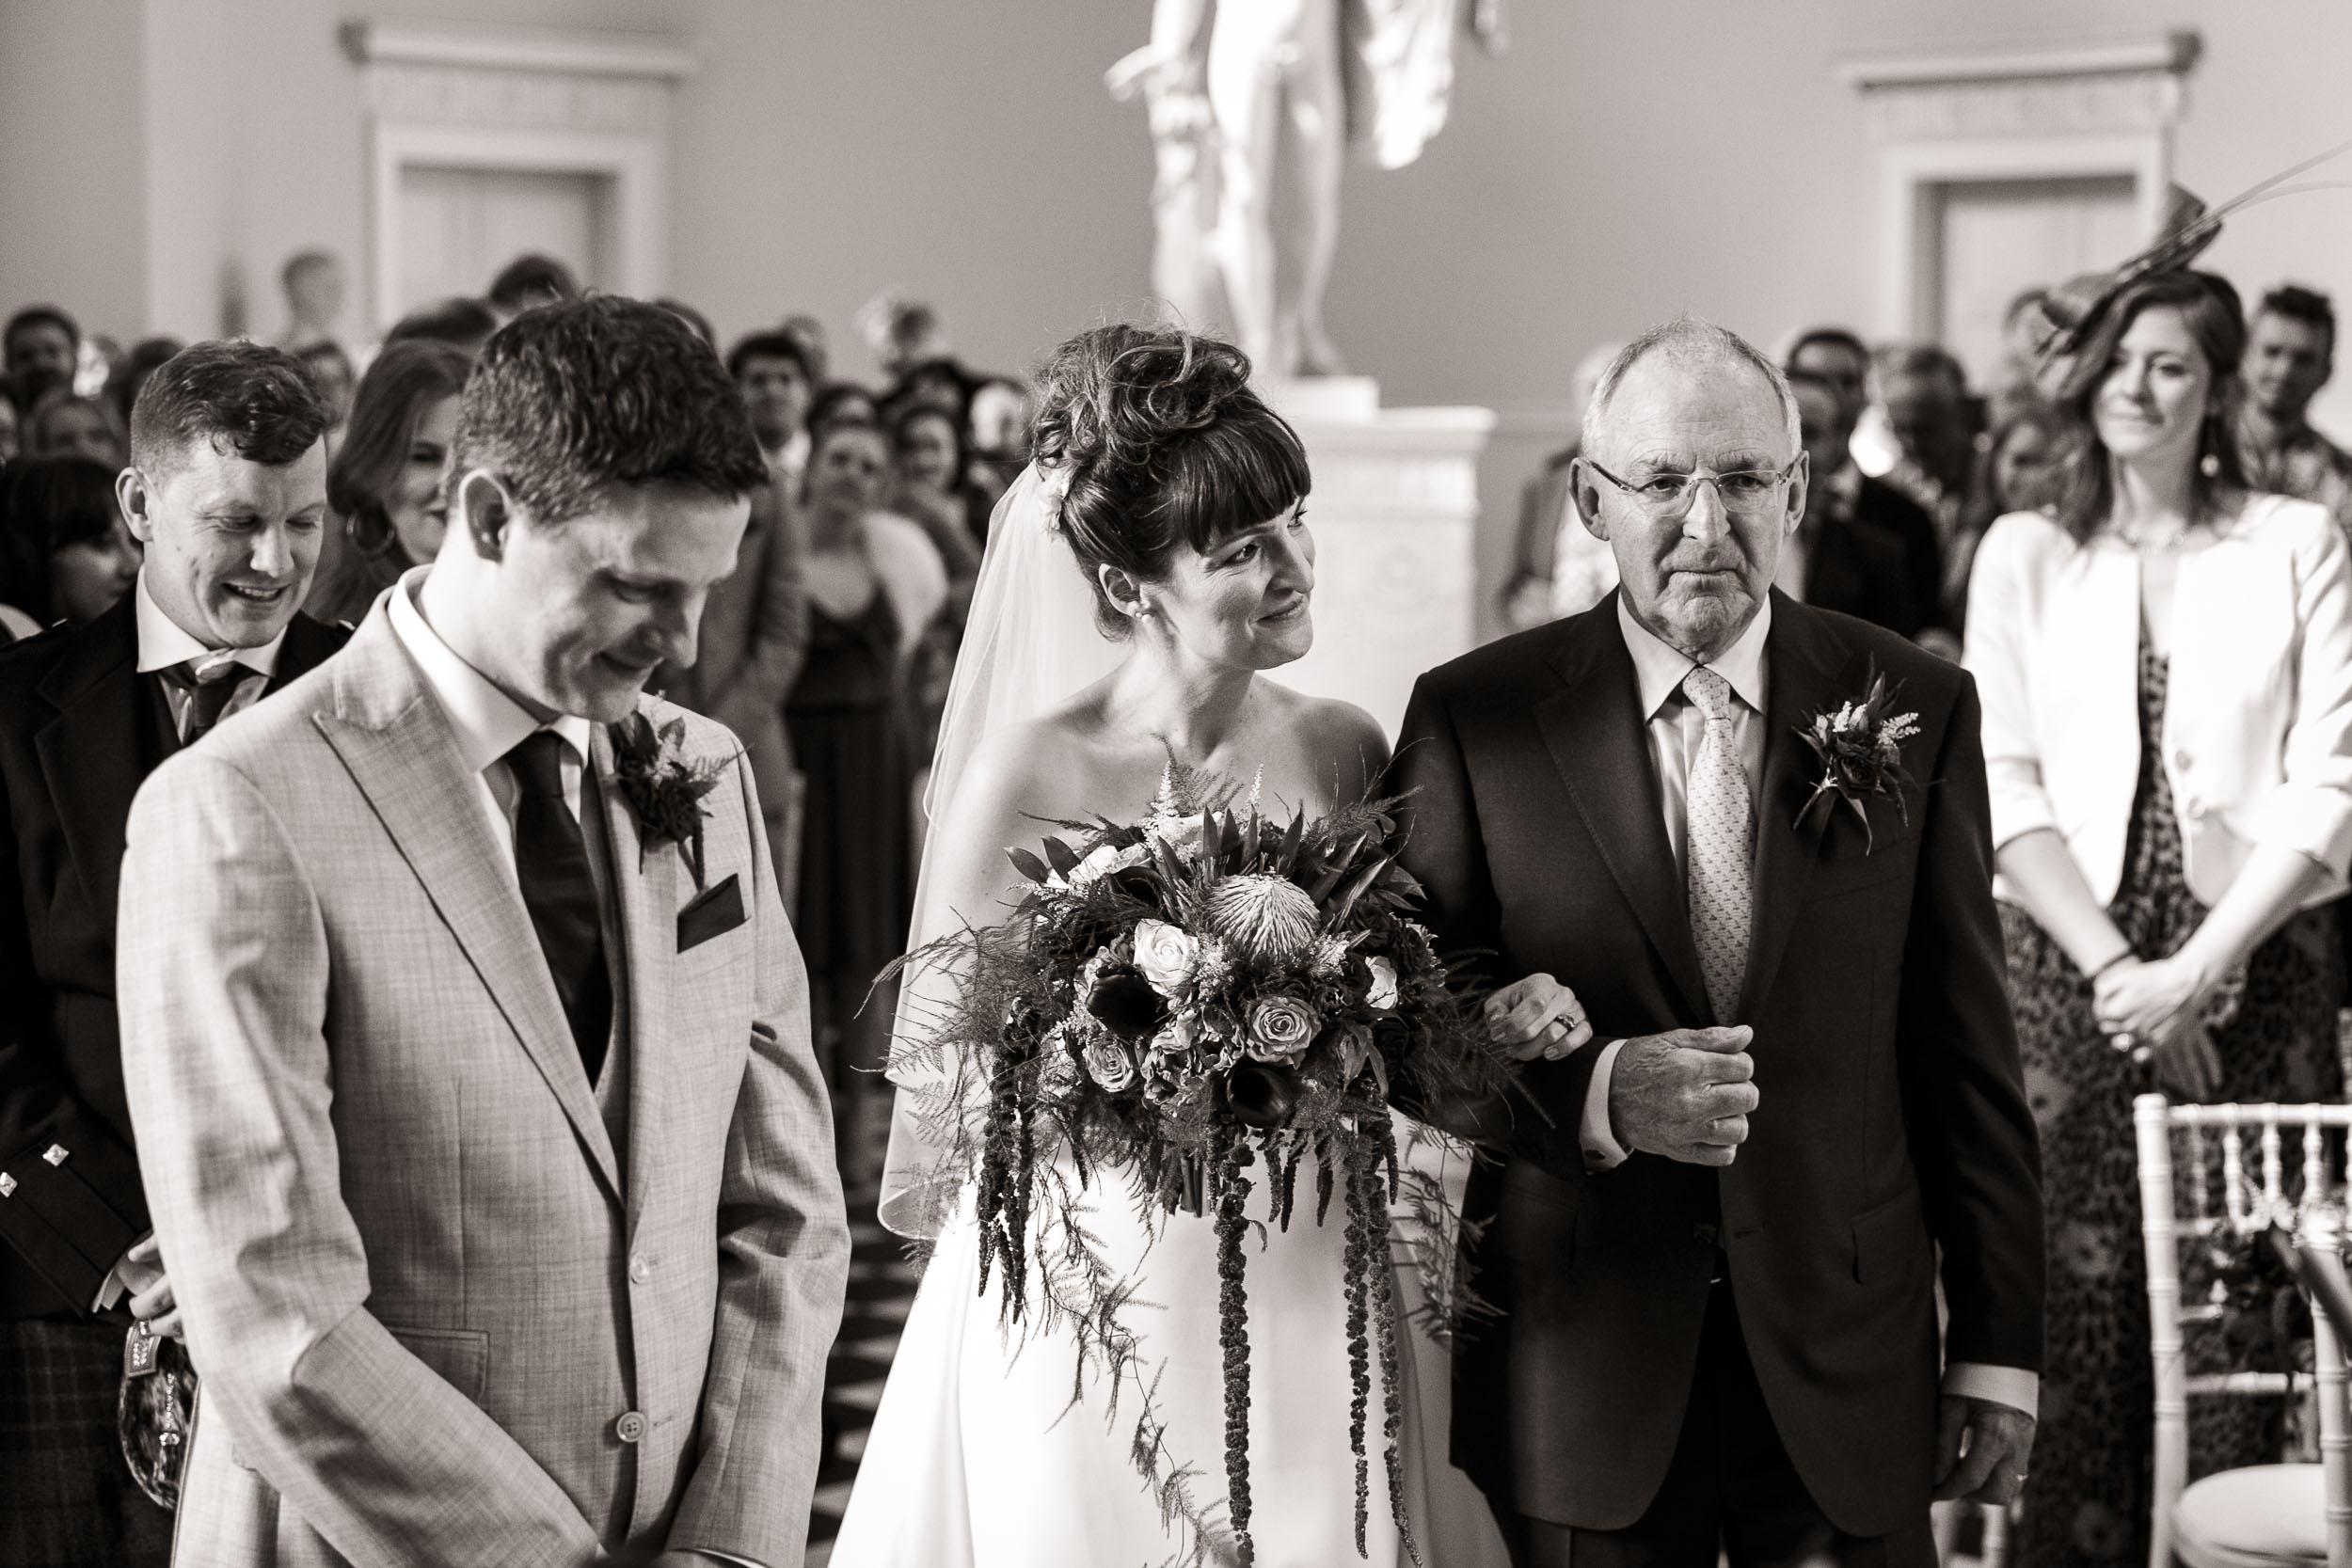 syon-house-wedding-photographer-london 051.jpg